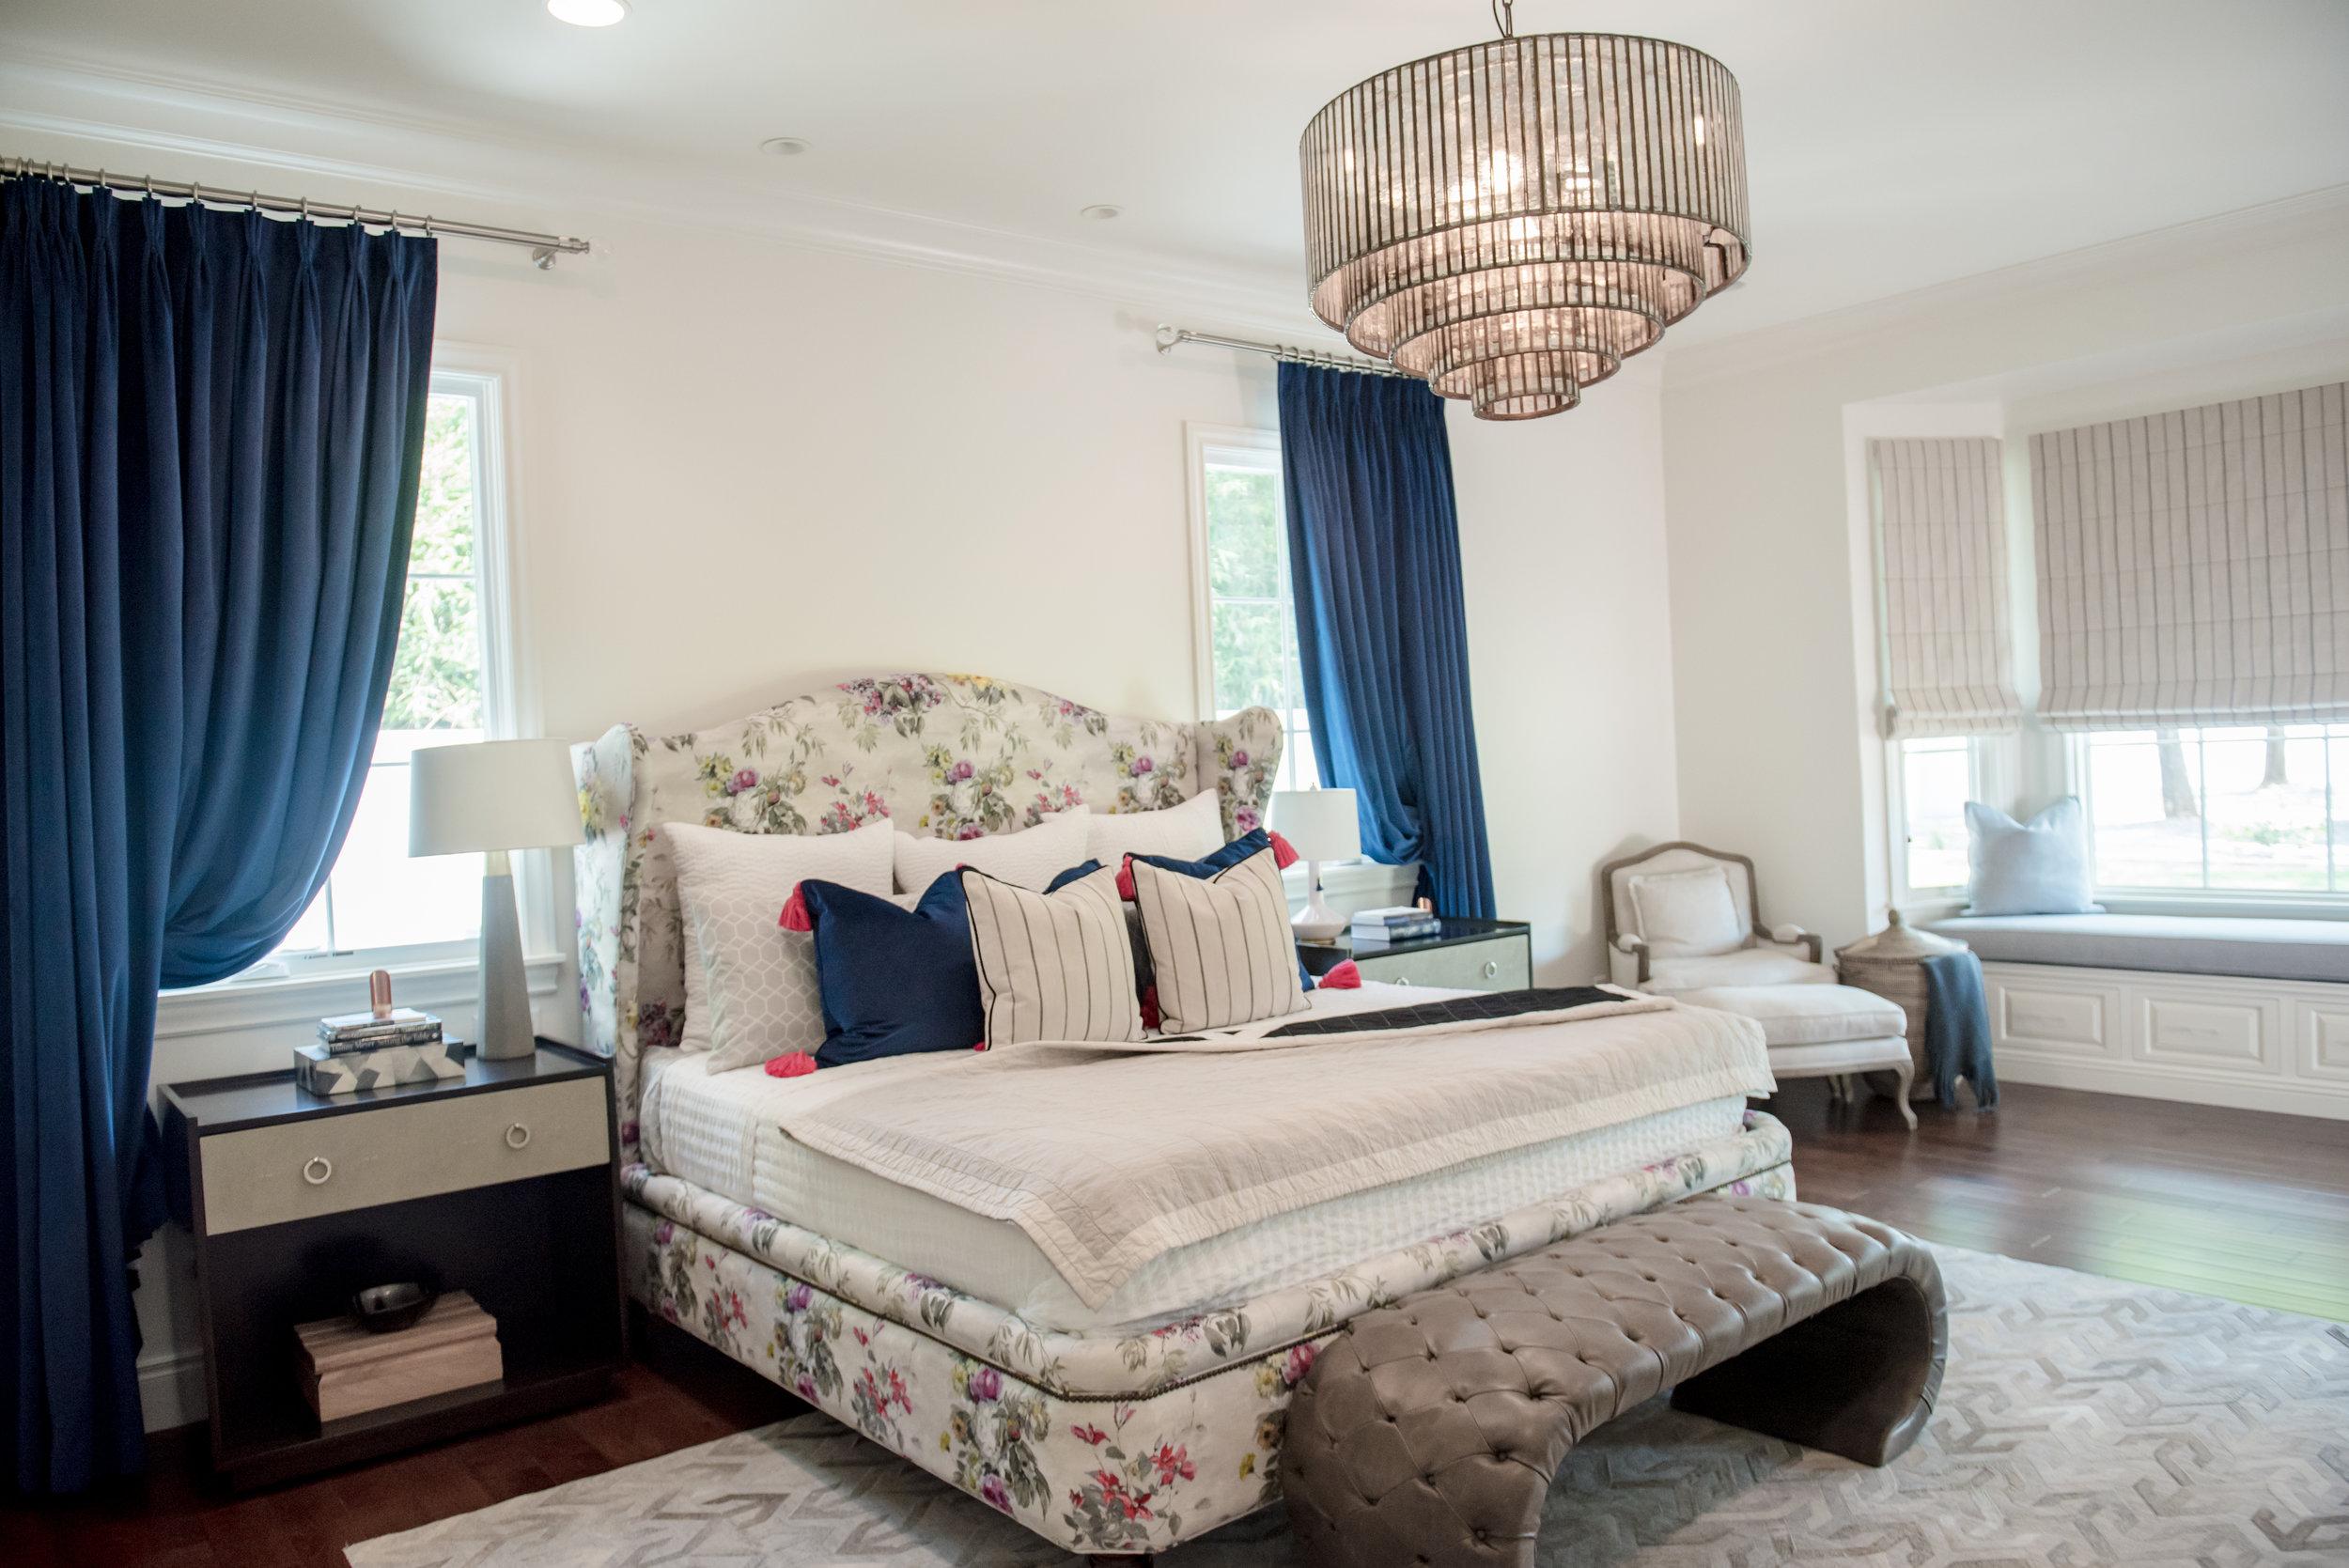 63+Master+Bedroom+Haironhide+Floral+Custom+Artwork+Leather+Tufting+Restorationhardware+Crystal.jpg